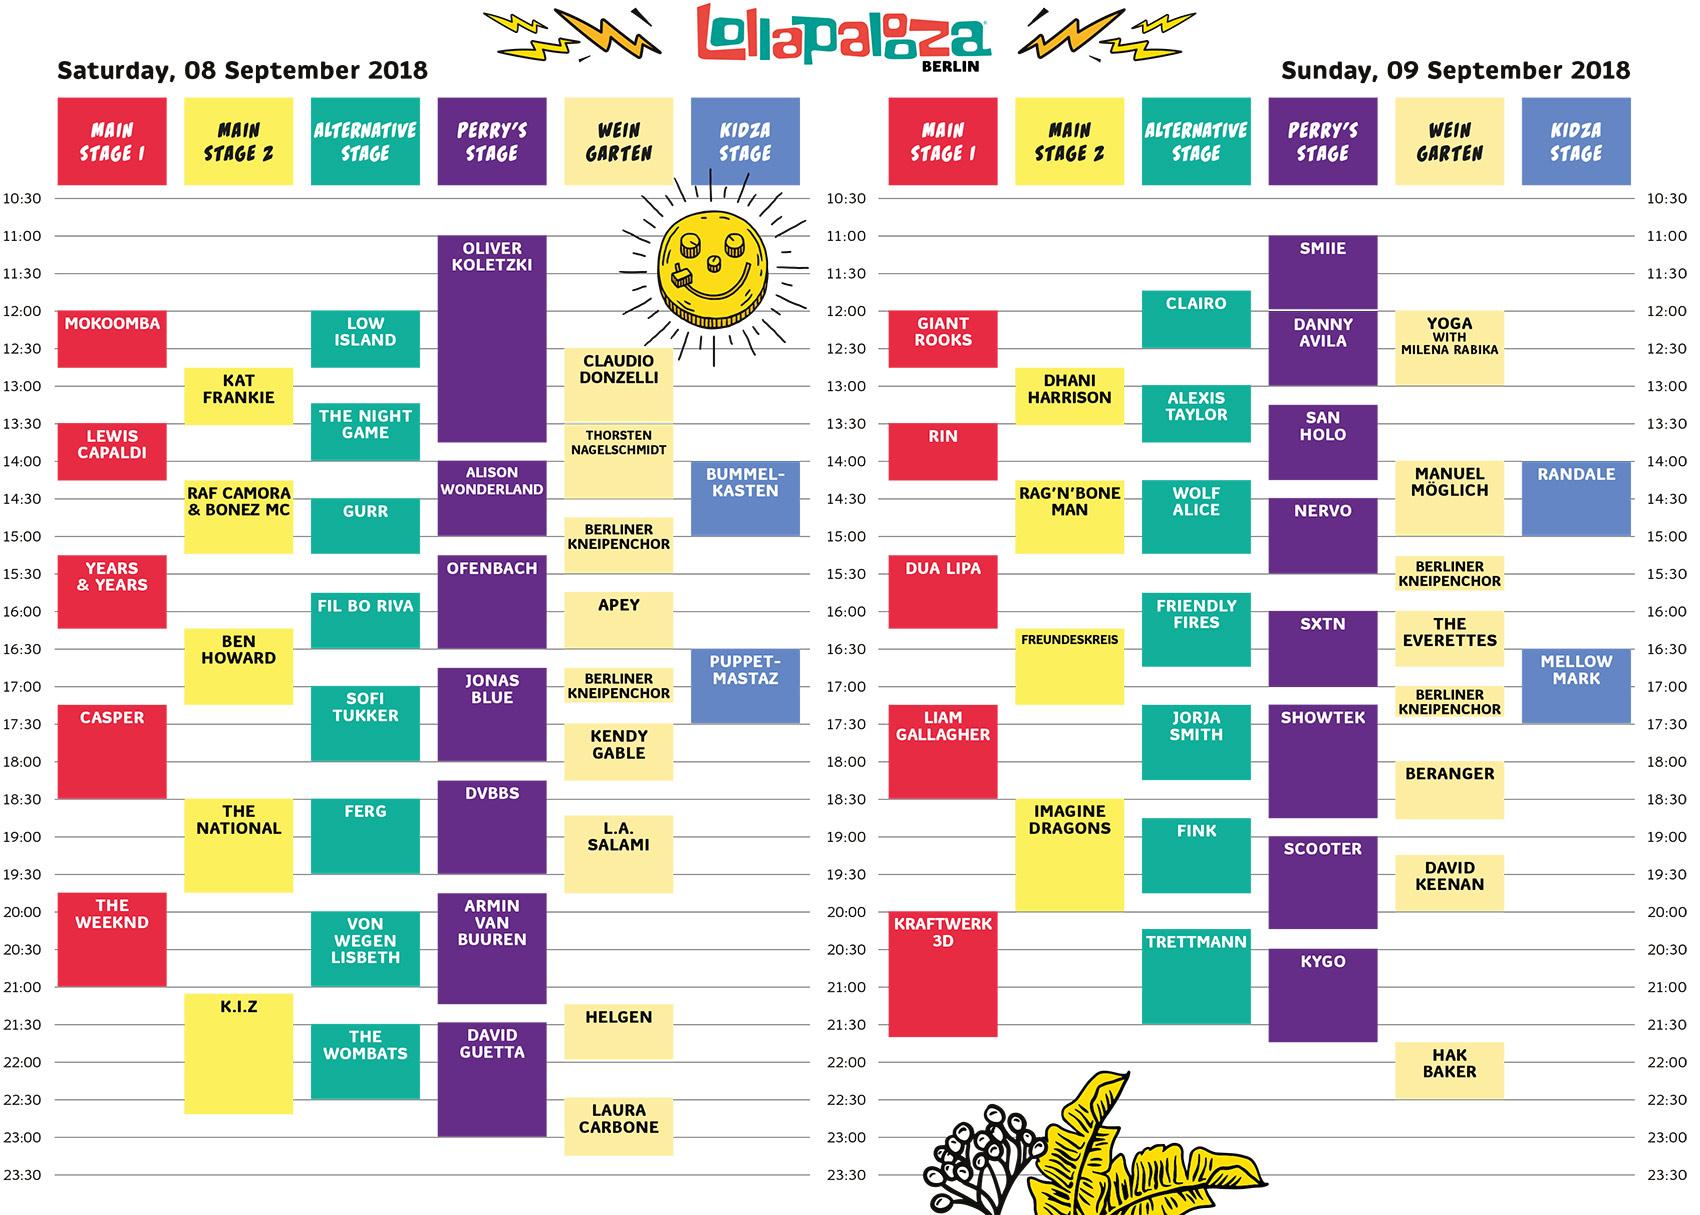 Lollapalooza Berlin 2018 - Wer spielt wann ? Die Running